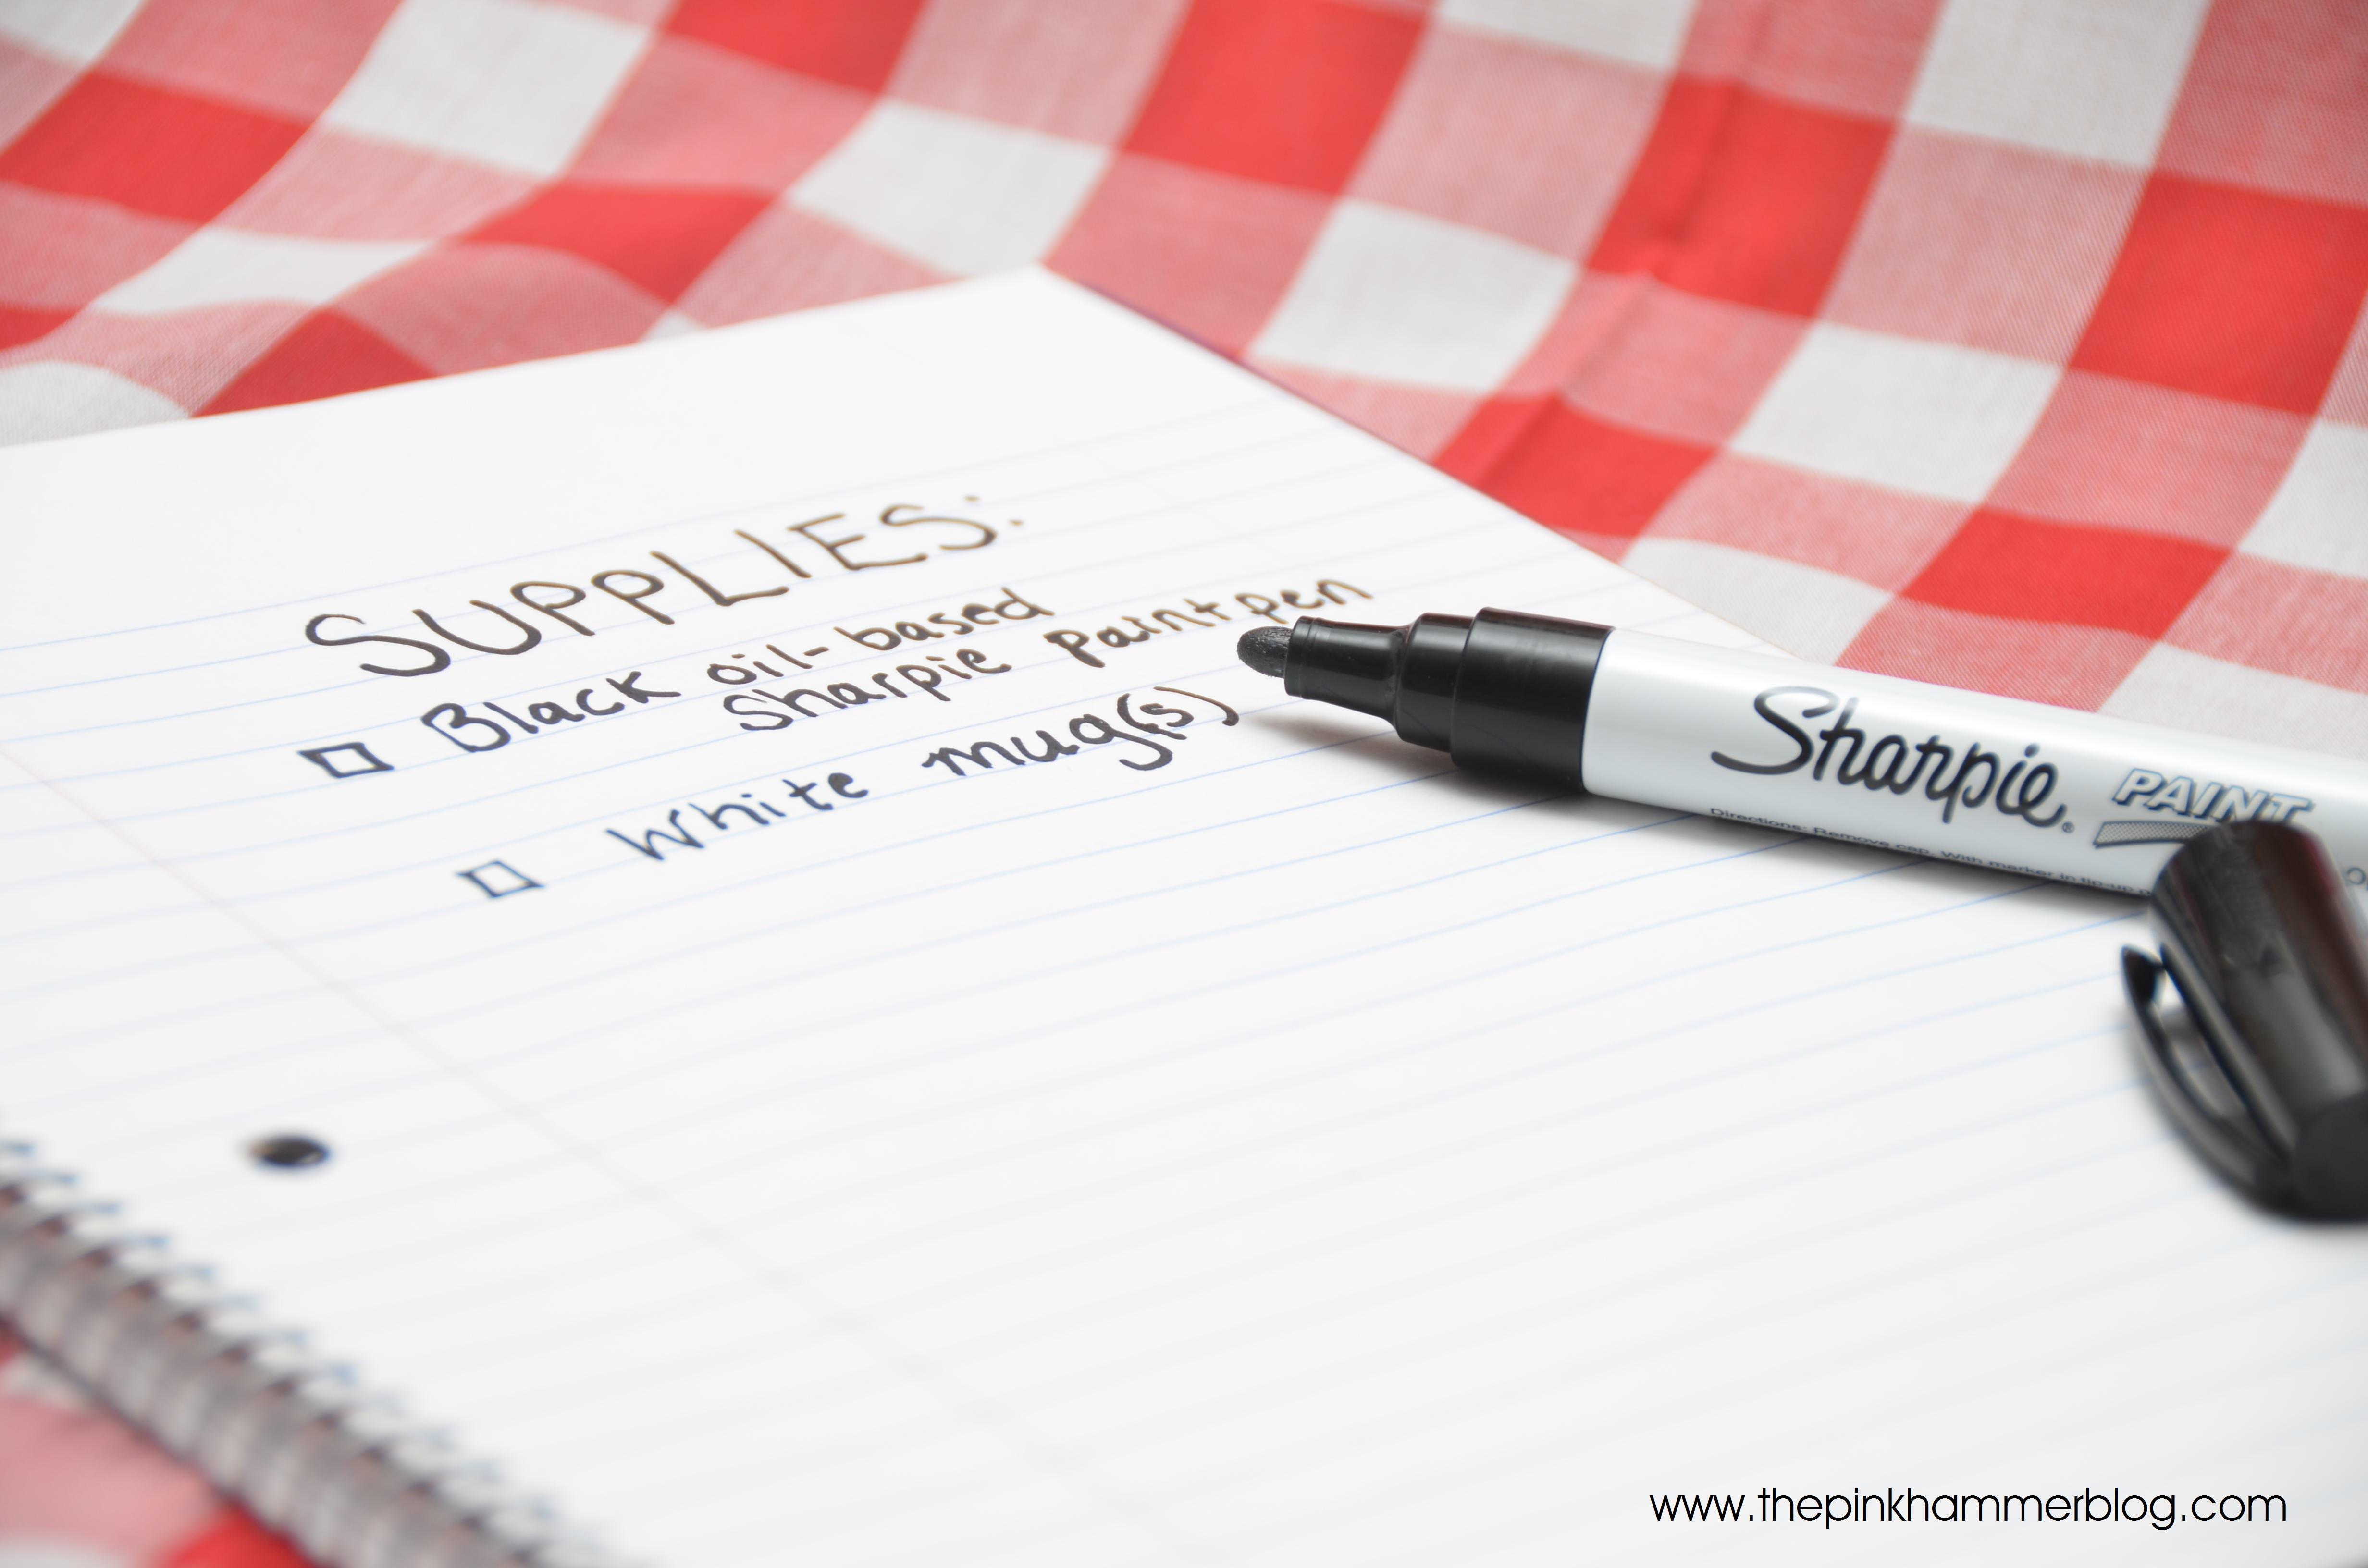 Craft ideas with sharpies - Black Sharpie Paint Marker